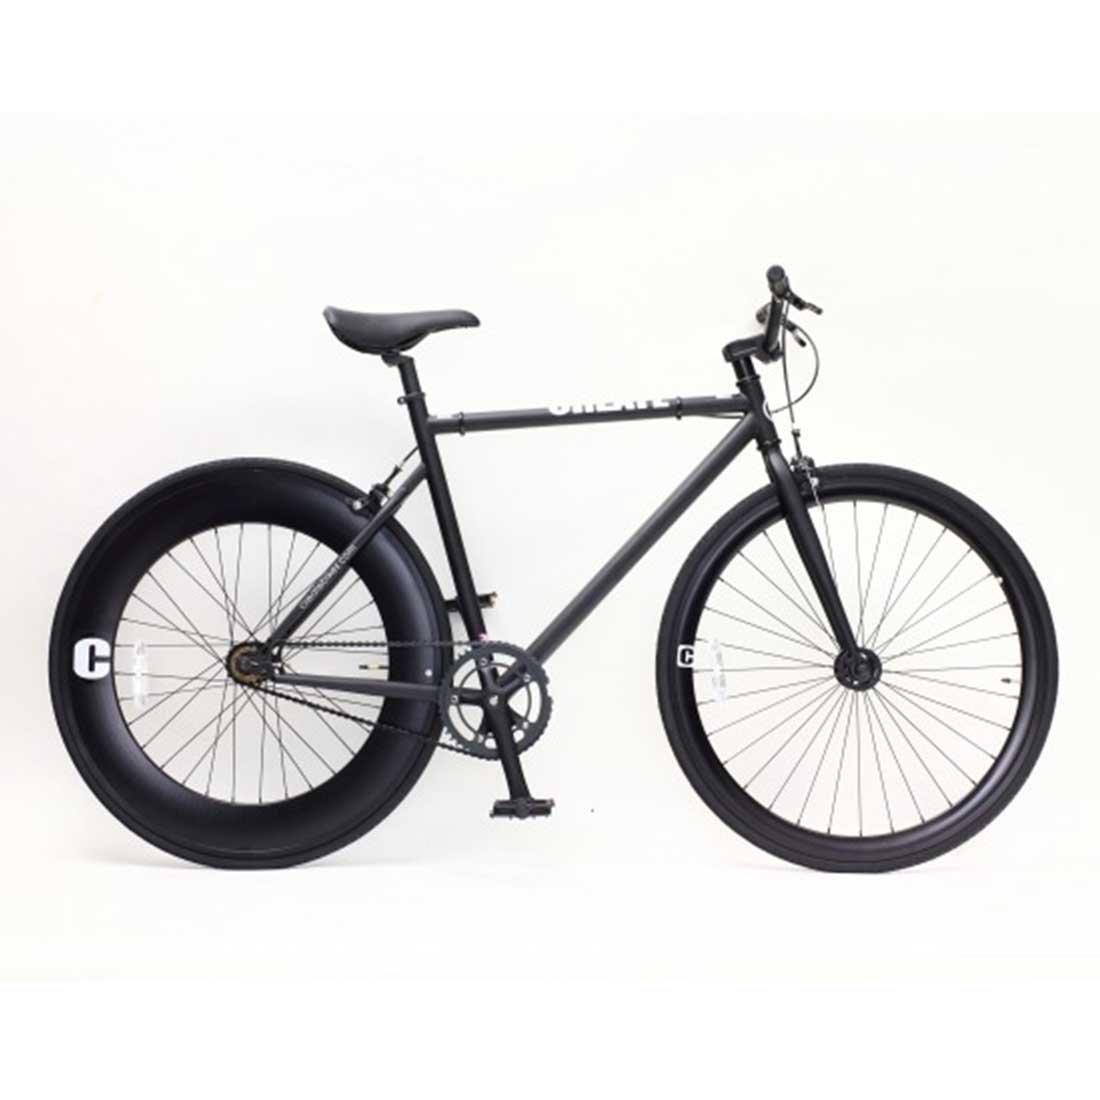 【CREATE BIKES Single-PisteBike】 ストリートピストバイク  湘南鵠沼海岸発信 B0765T6TNG 460mm(160cm~)|ブラック ブラック 460mm(160cm~)